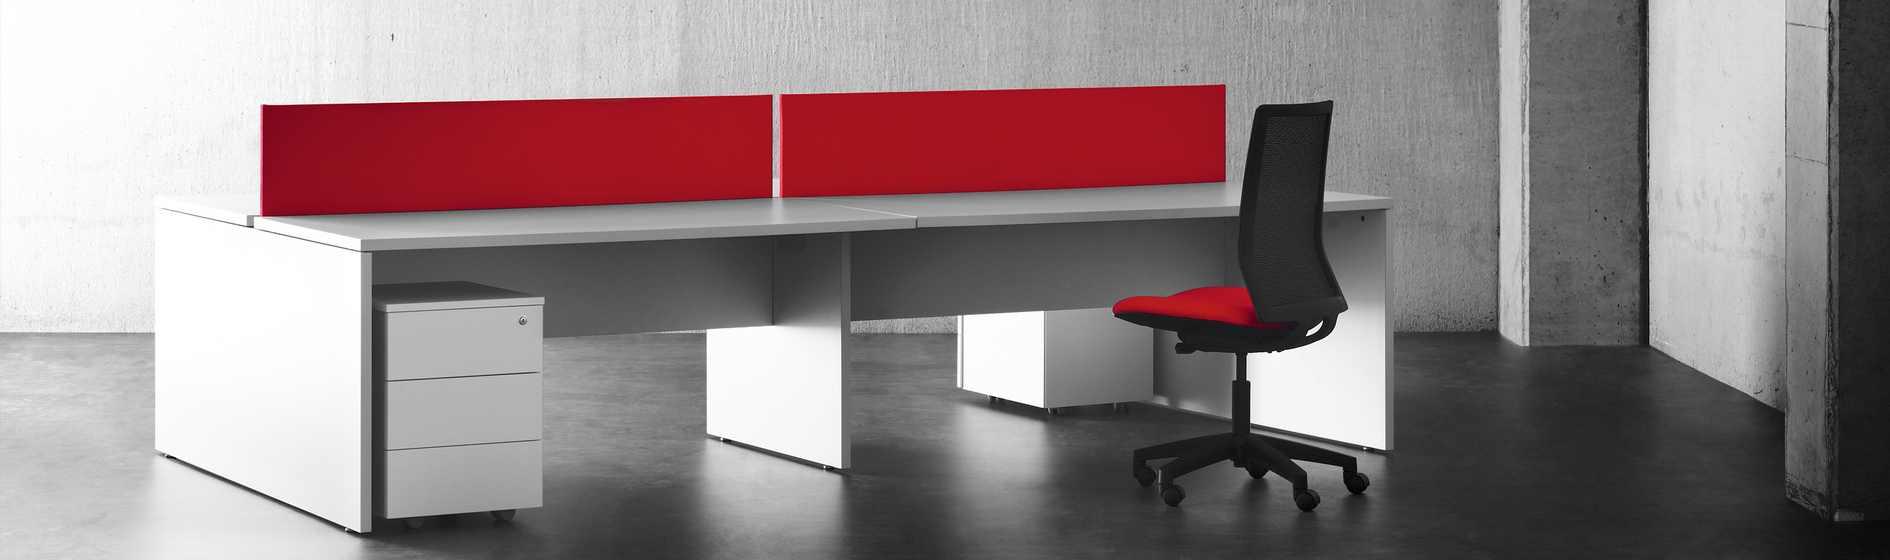 Muebles ibiza interiorismo for Muebles de oficina ibiza